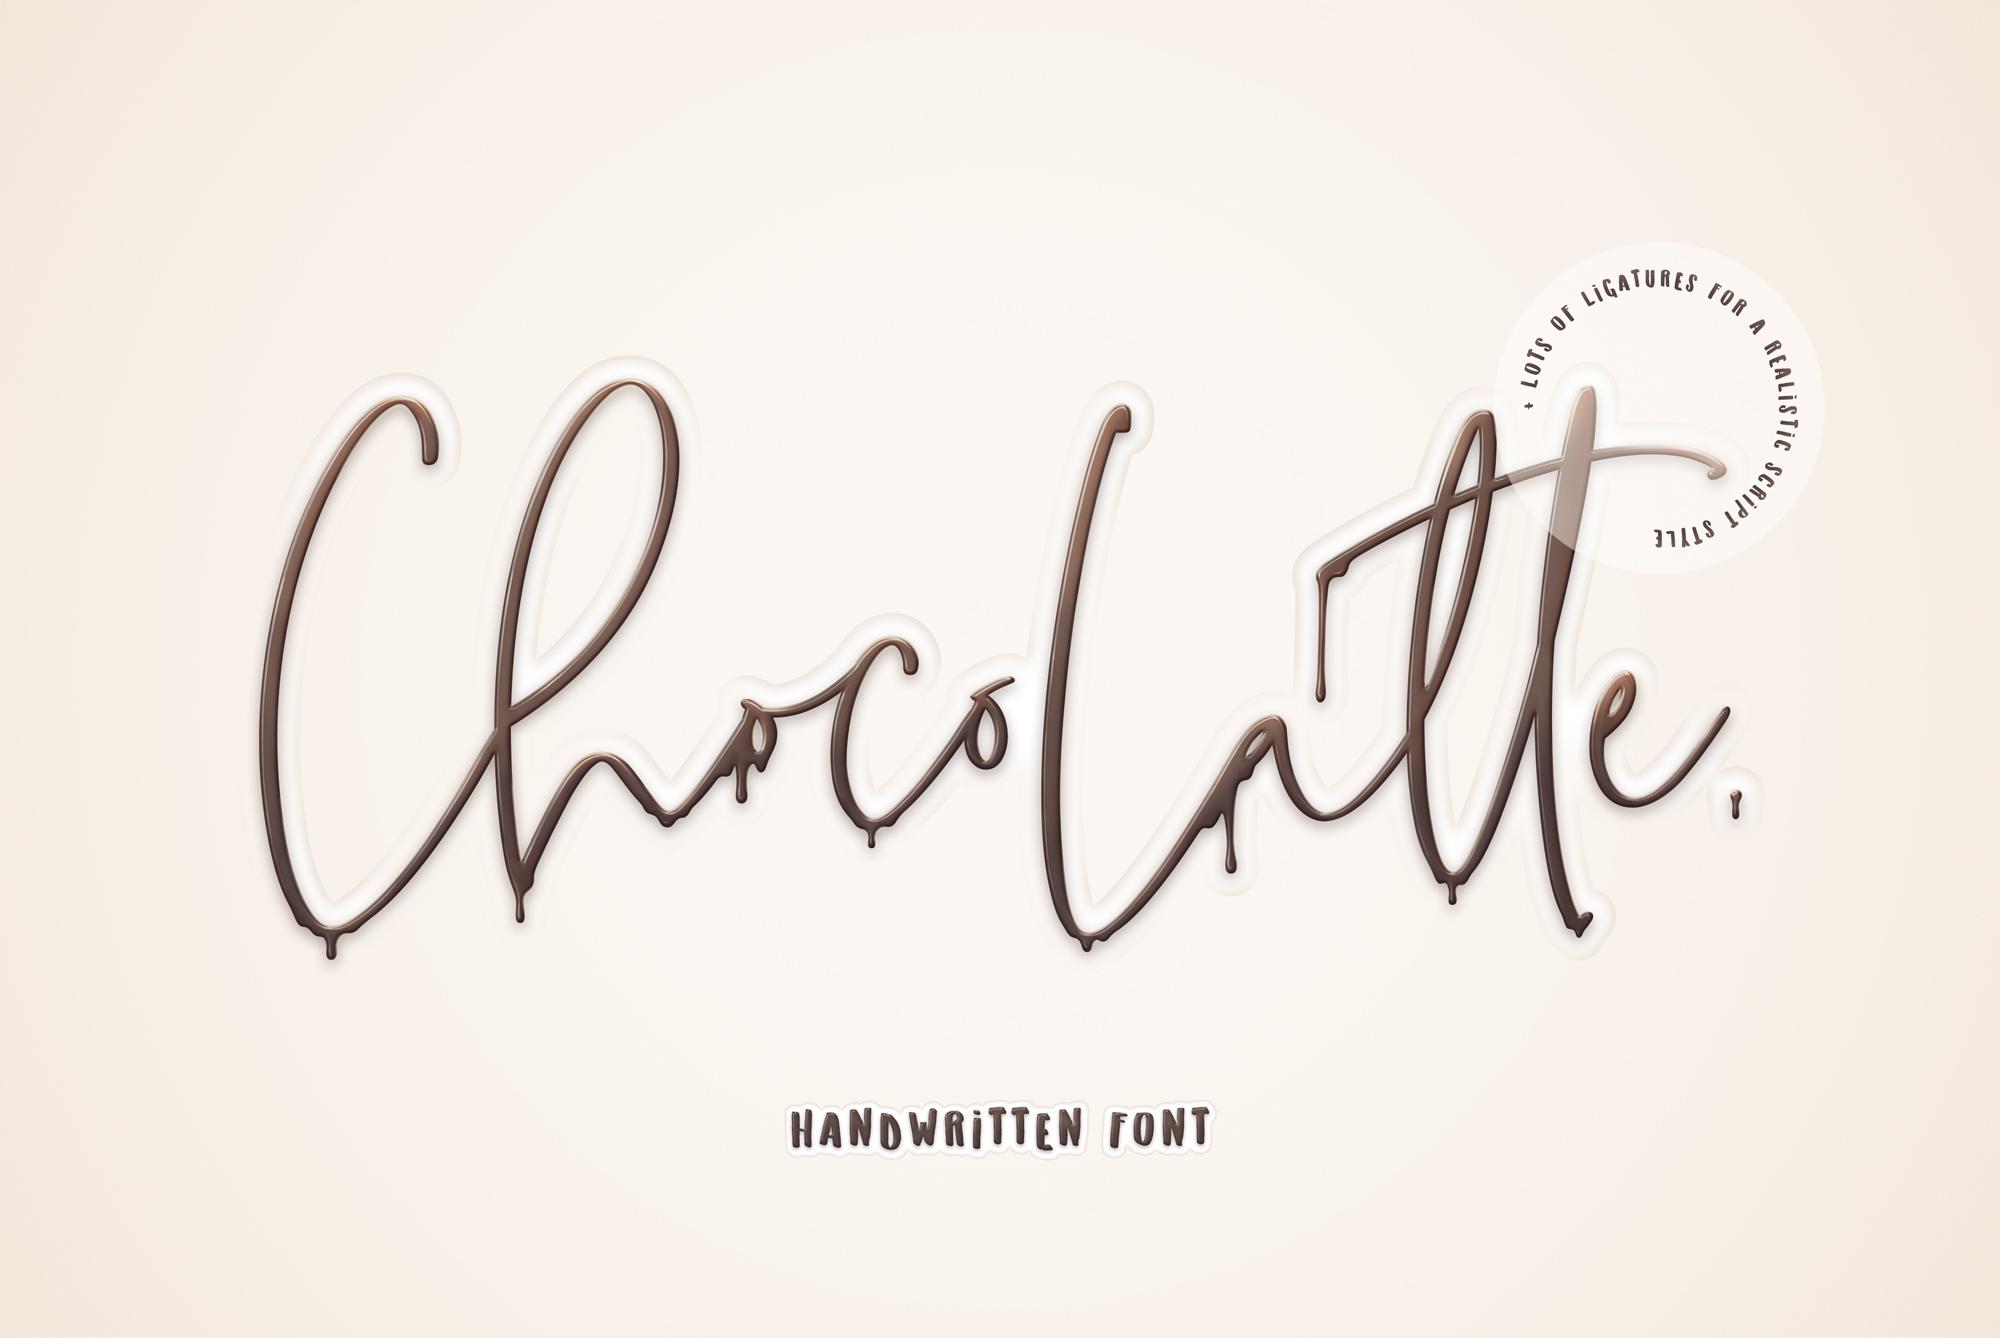 ChocoLatte Handwritten Script Font example image 1